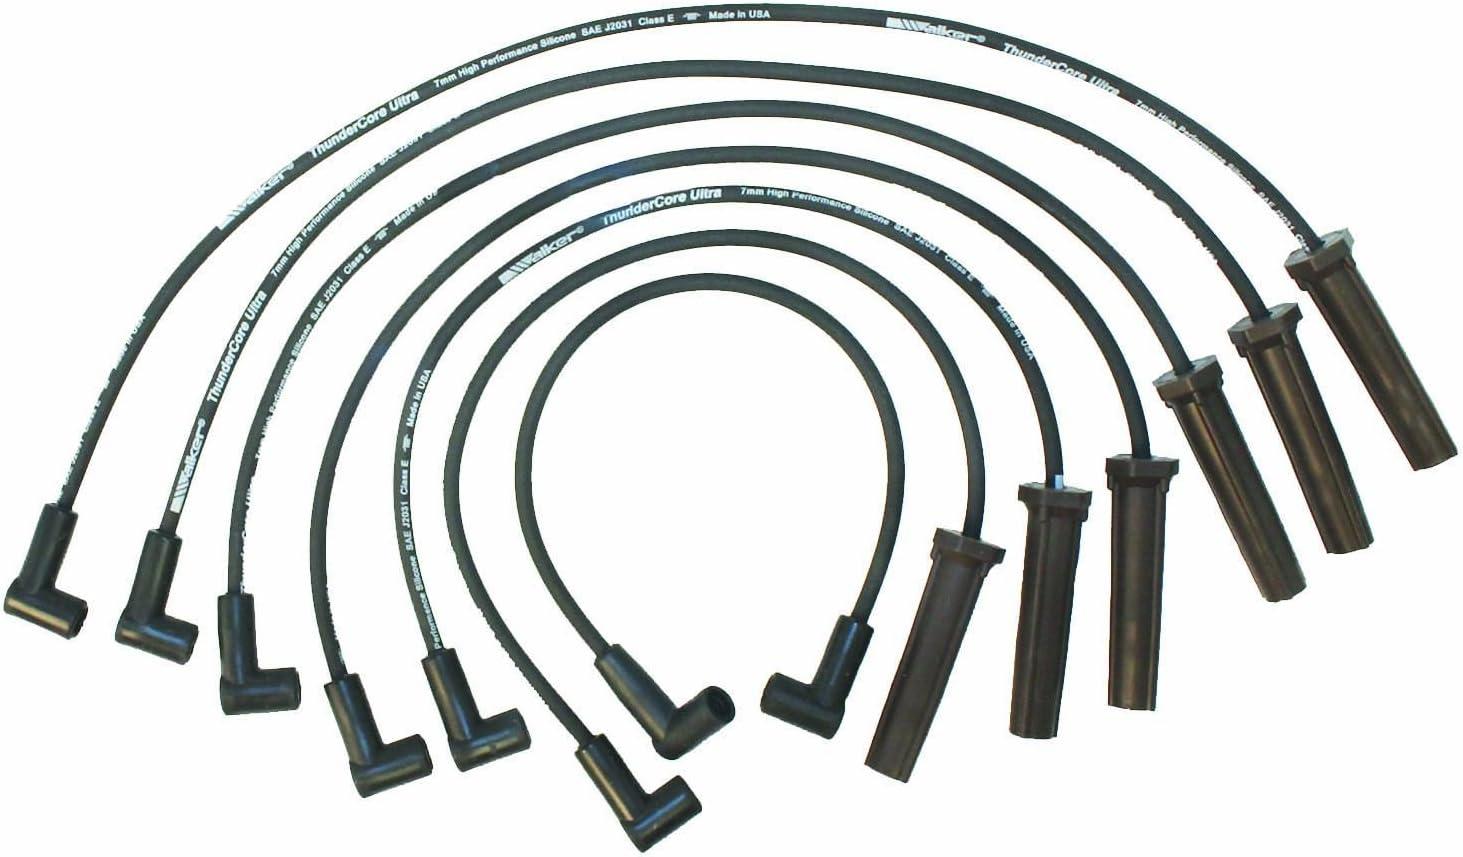 Walker Products 900-1300 Premium Dedication Set Wire Spark Plug Seasonal Wrap Introduction